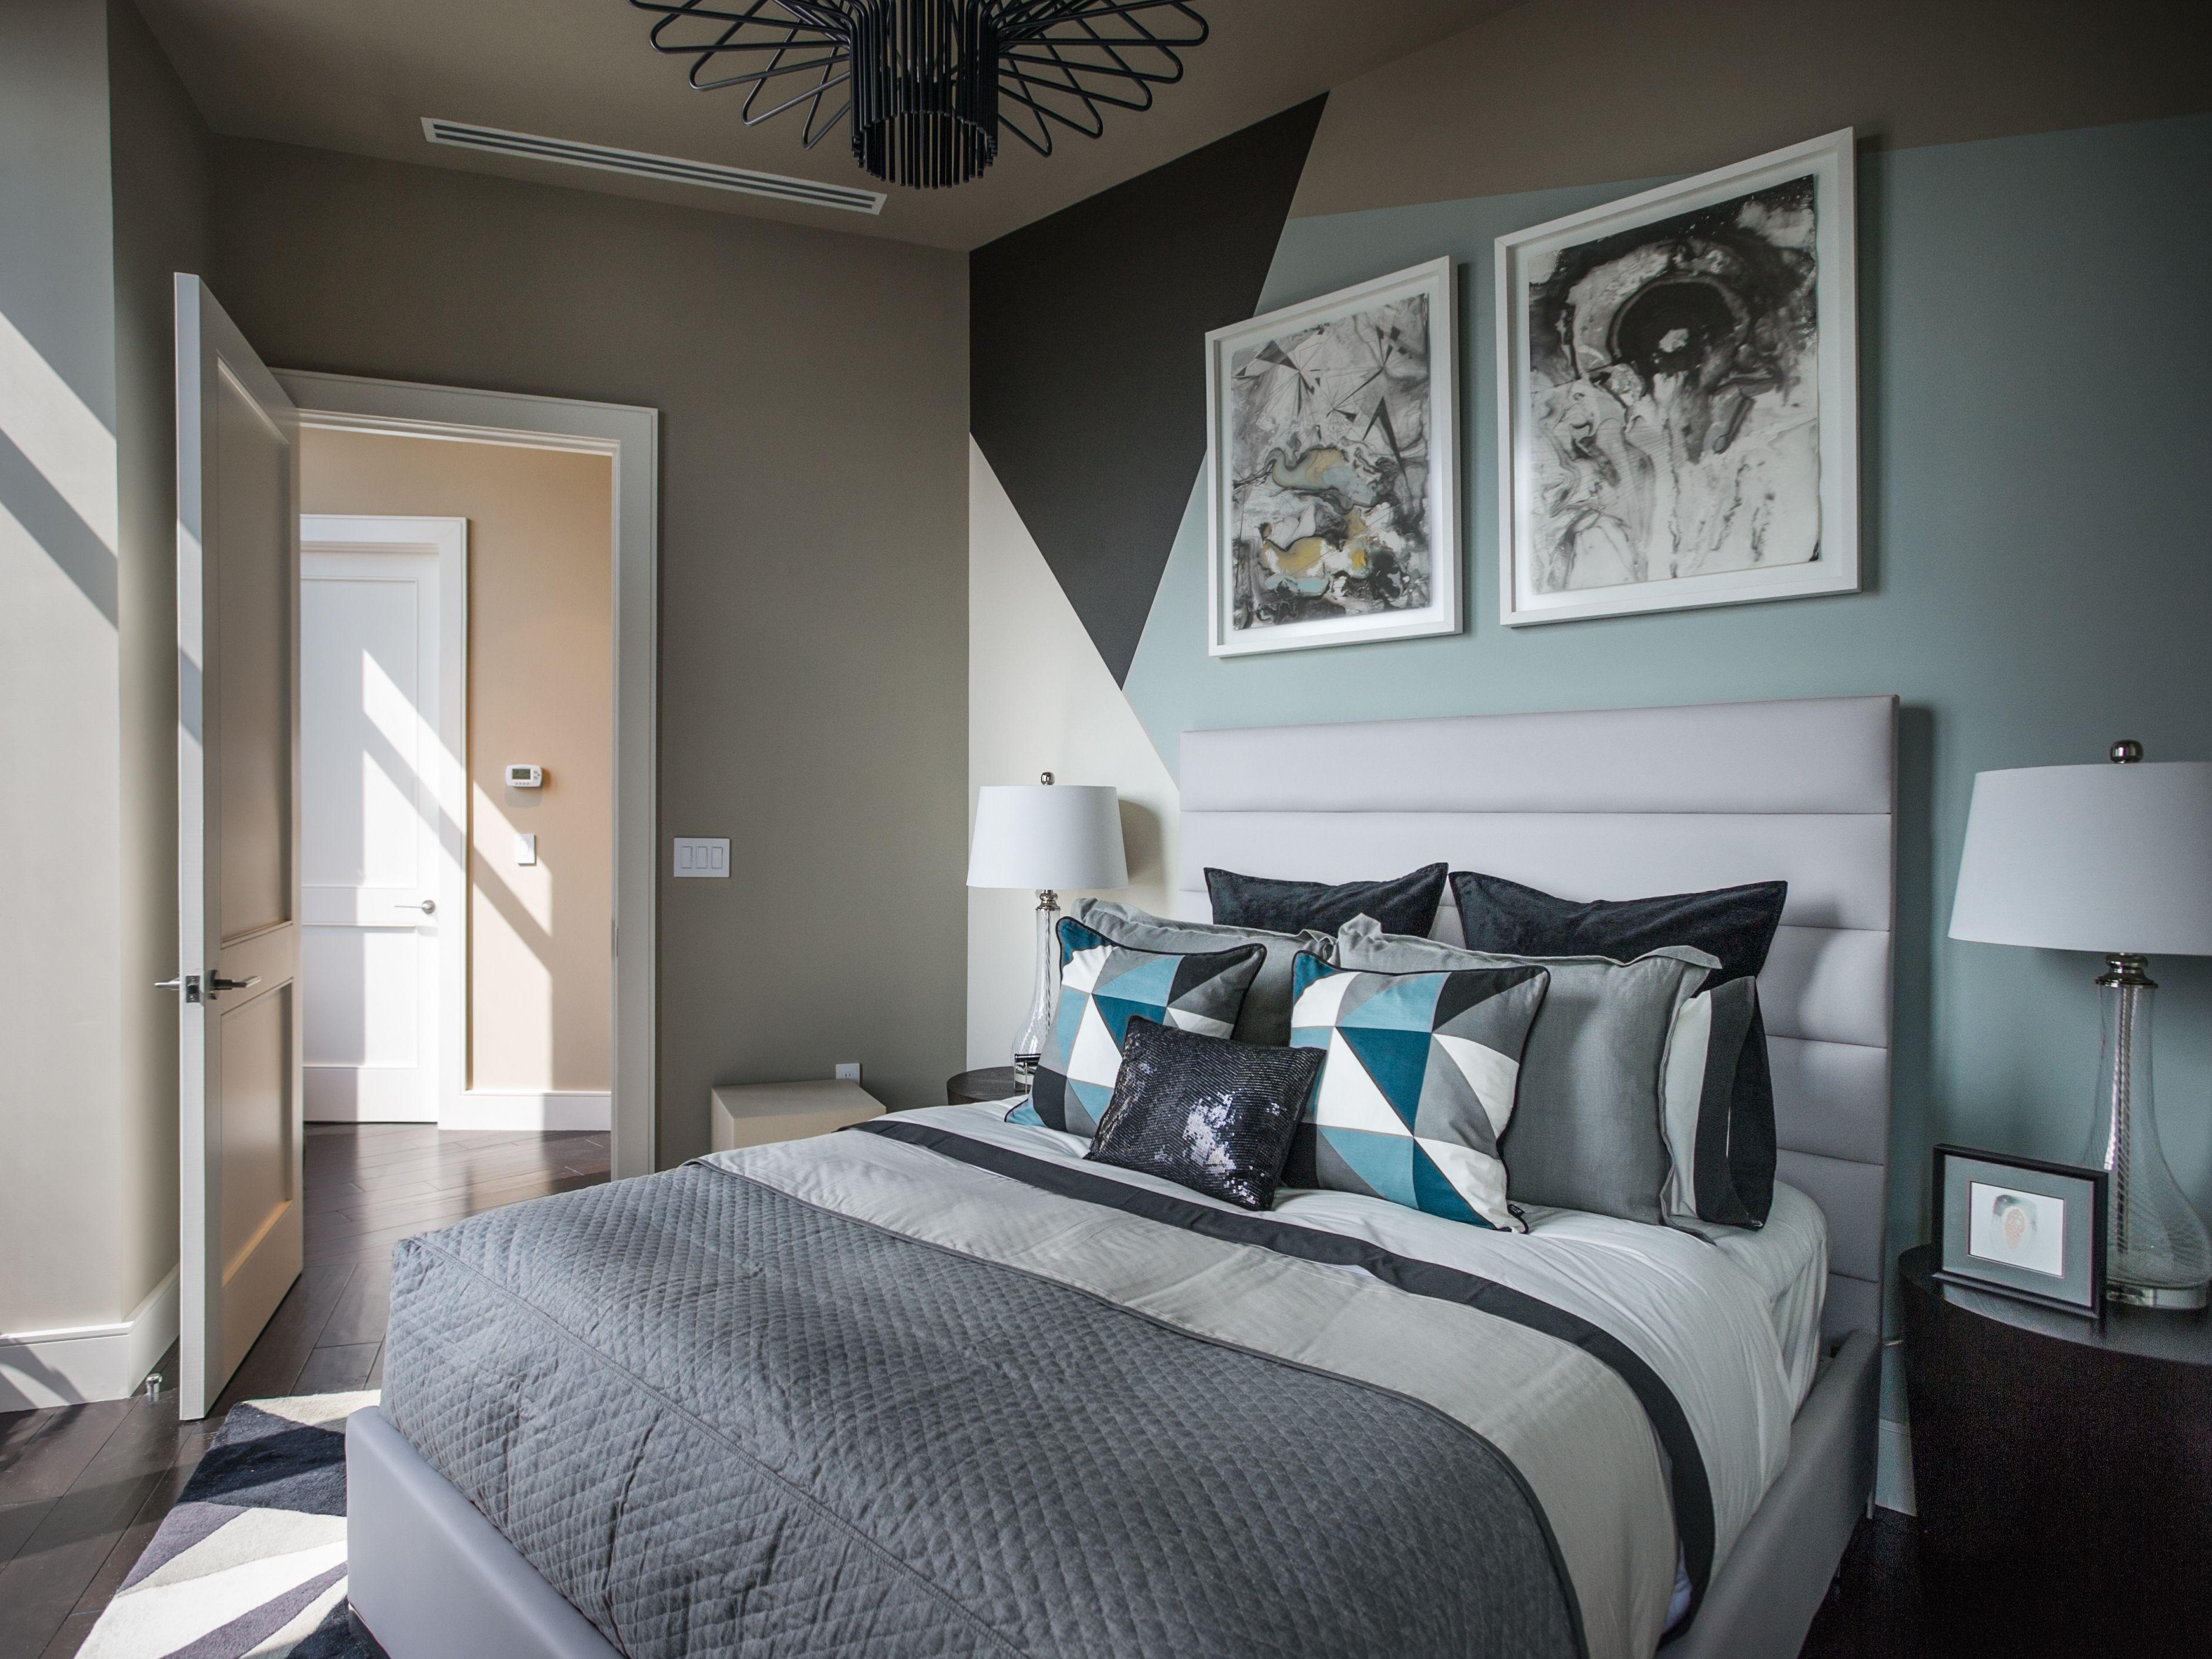 Spare Bedroom Ideas - Dgmagnets.com | 3194 Guest Bedroom ...